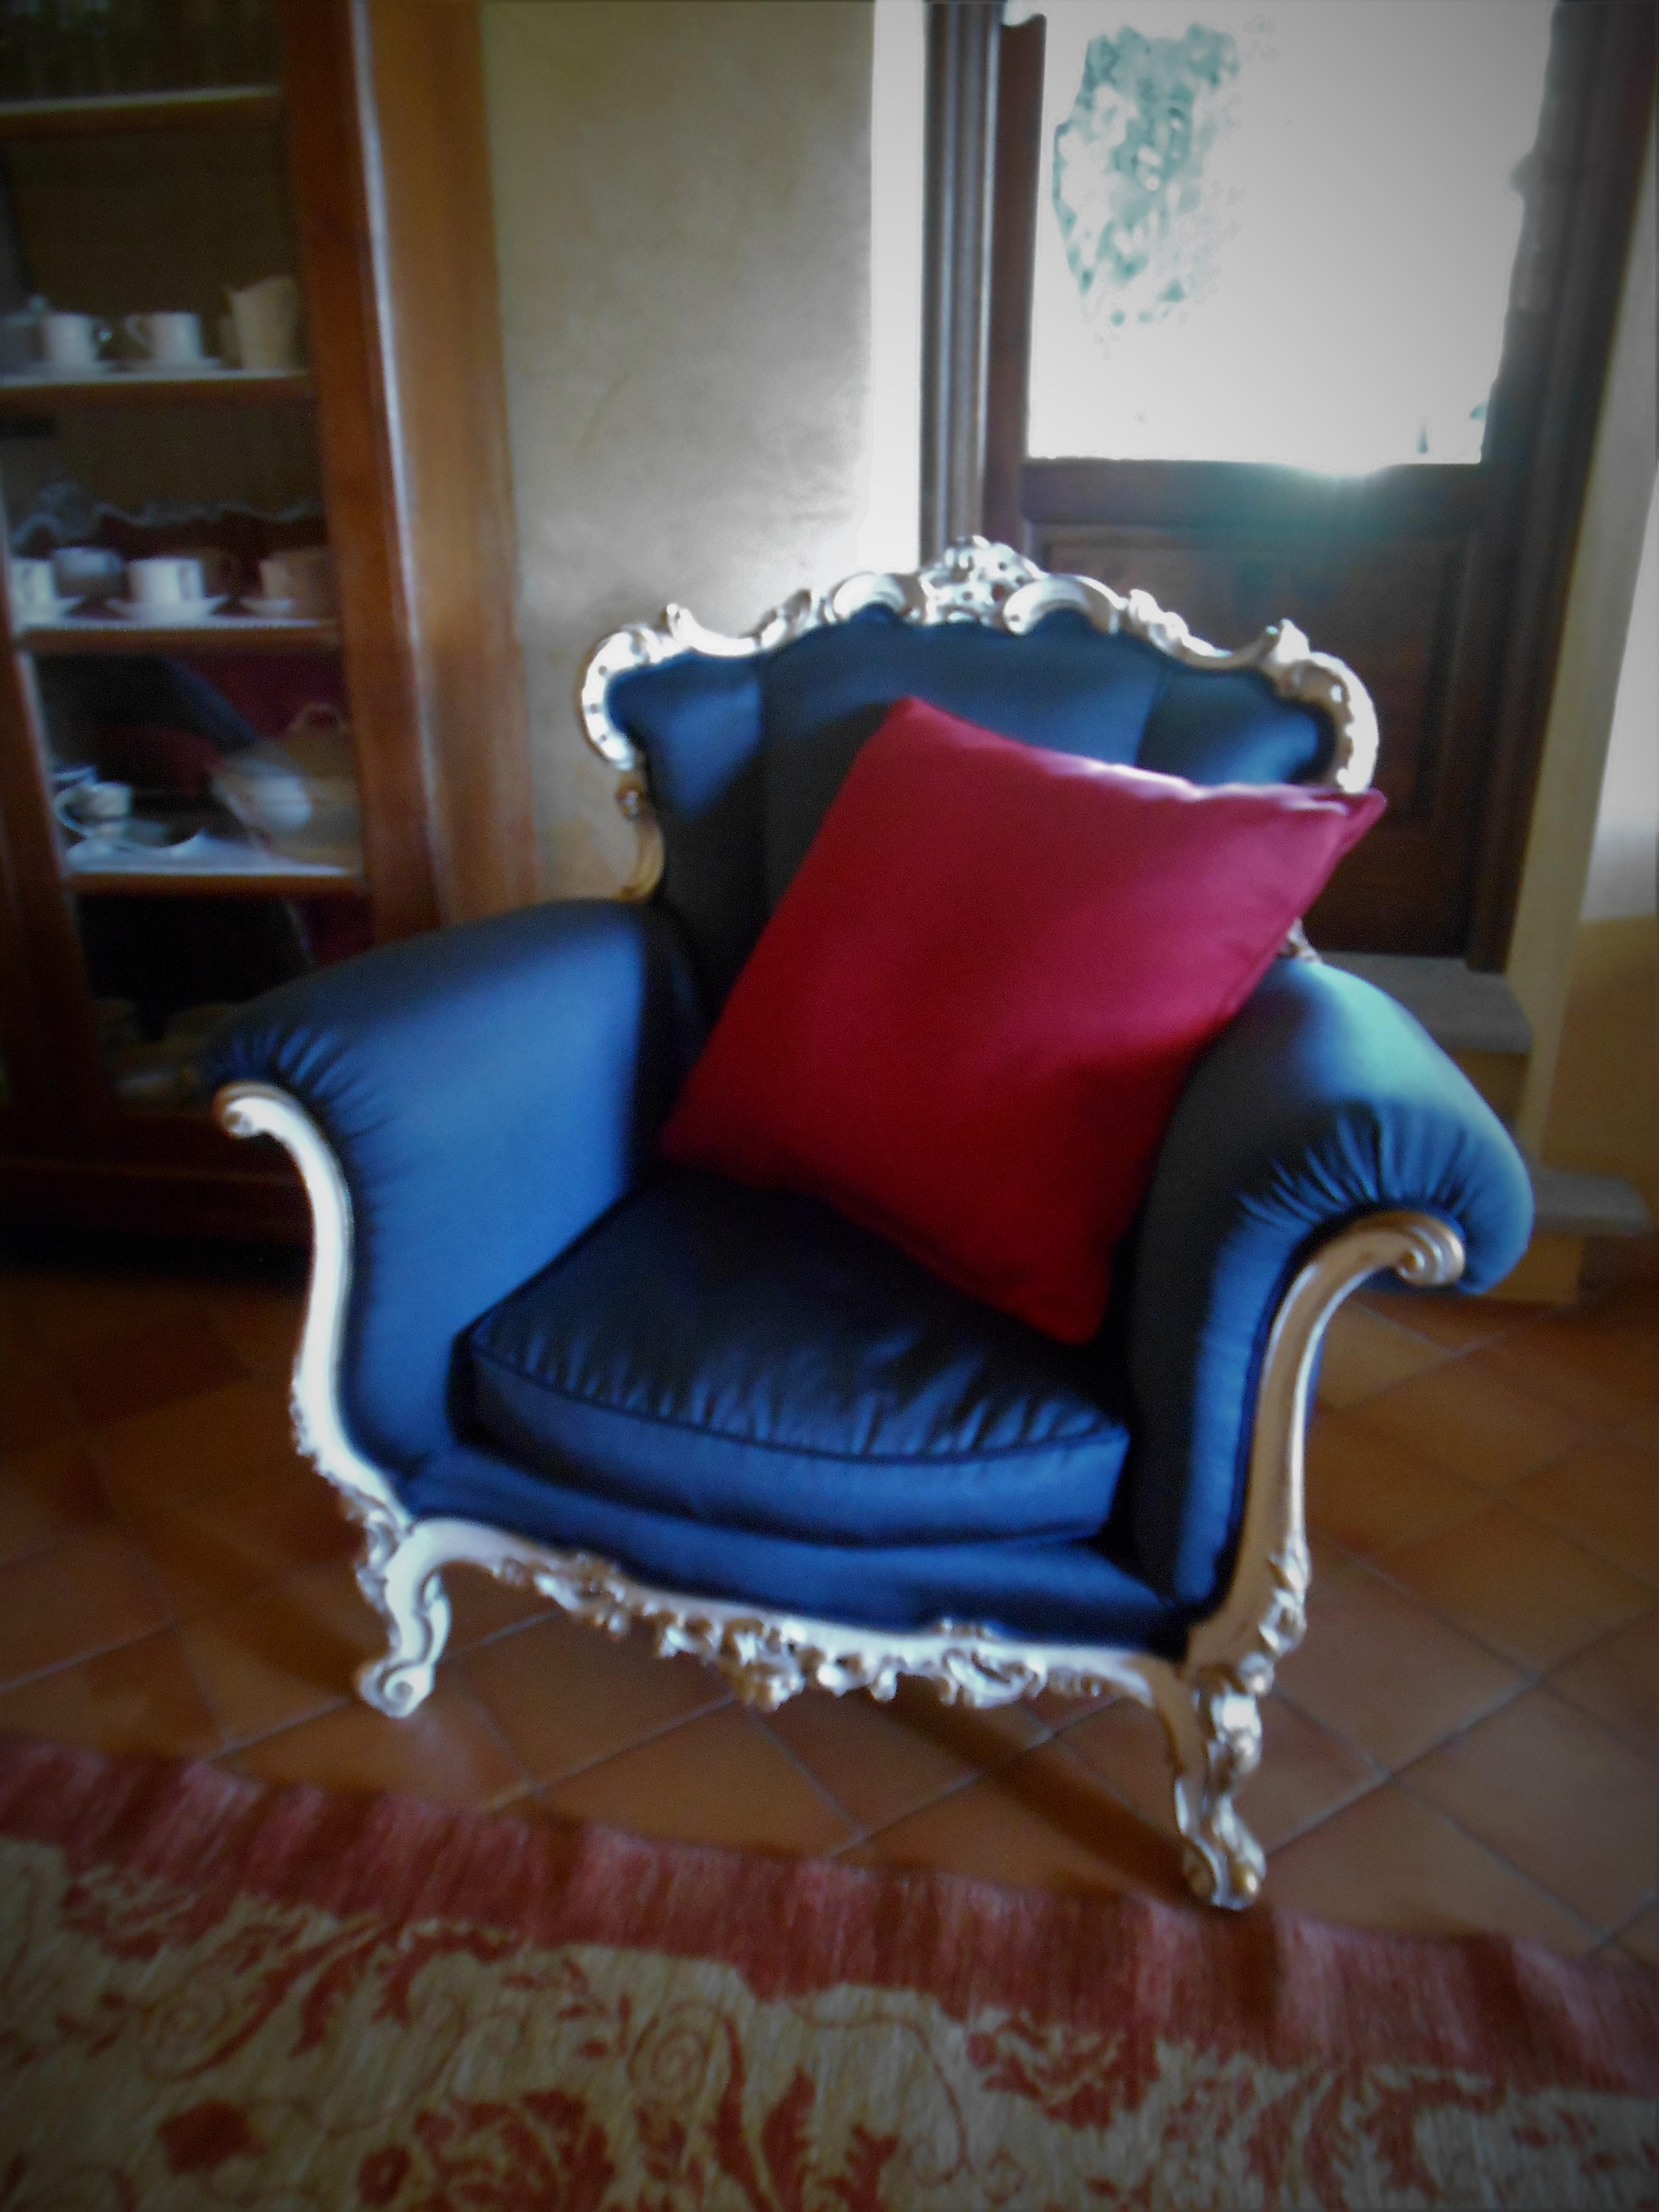 Poltrona in stile Barocco piemontese – Secolor